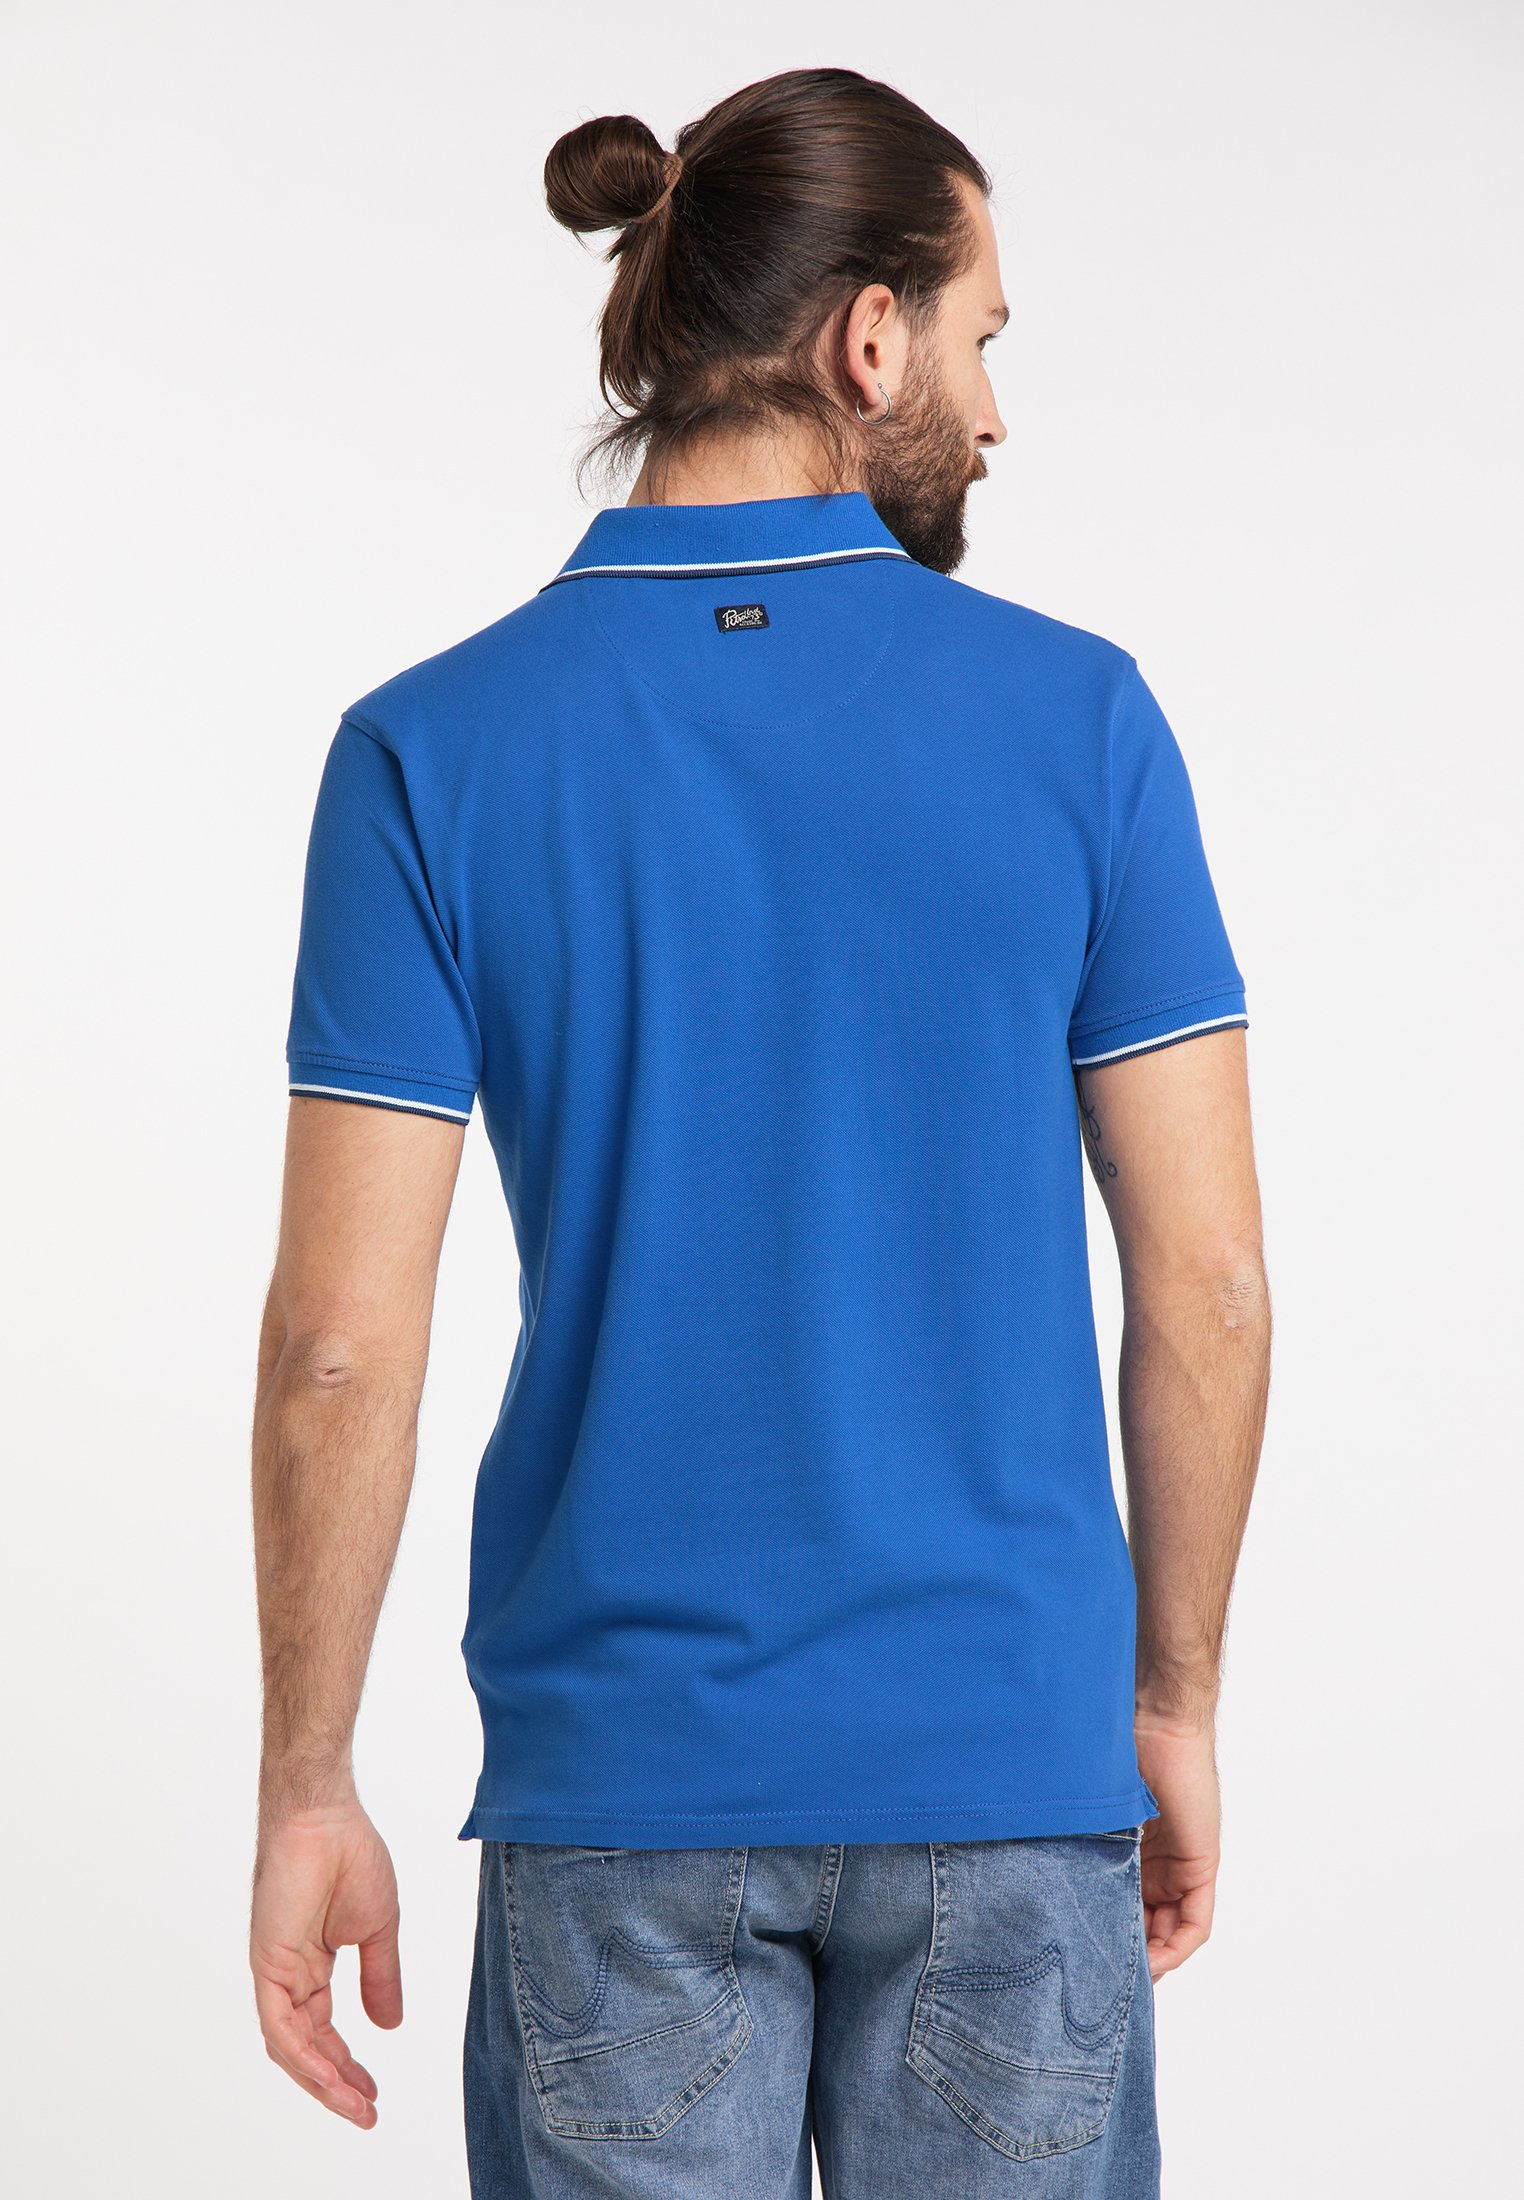 Petrol Industries Polo shirt - seascape 6lx6f